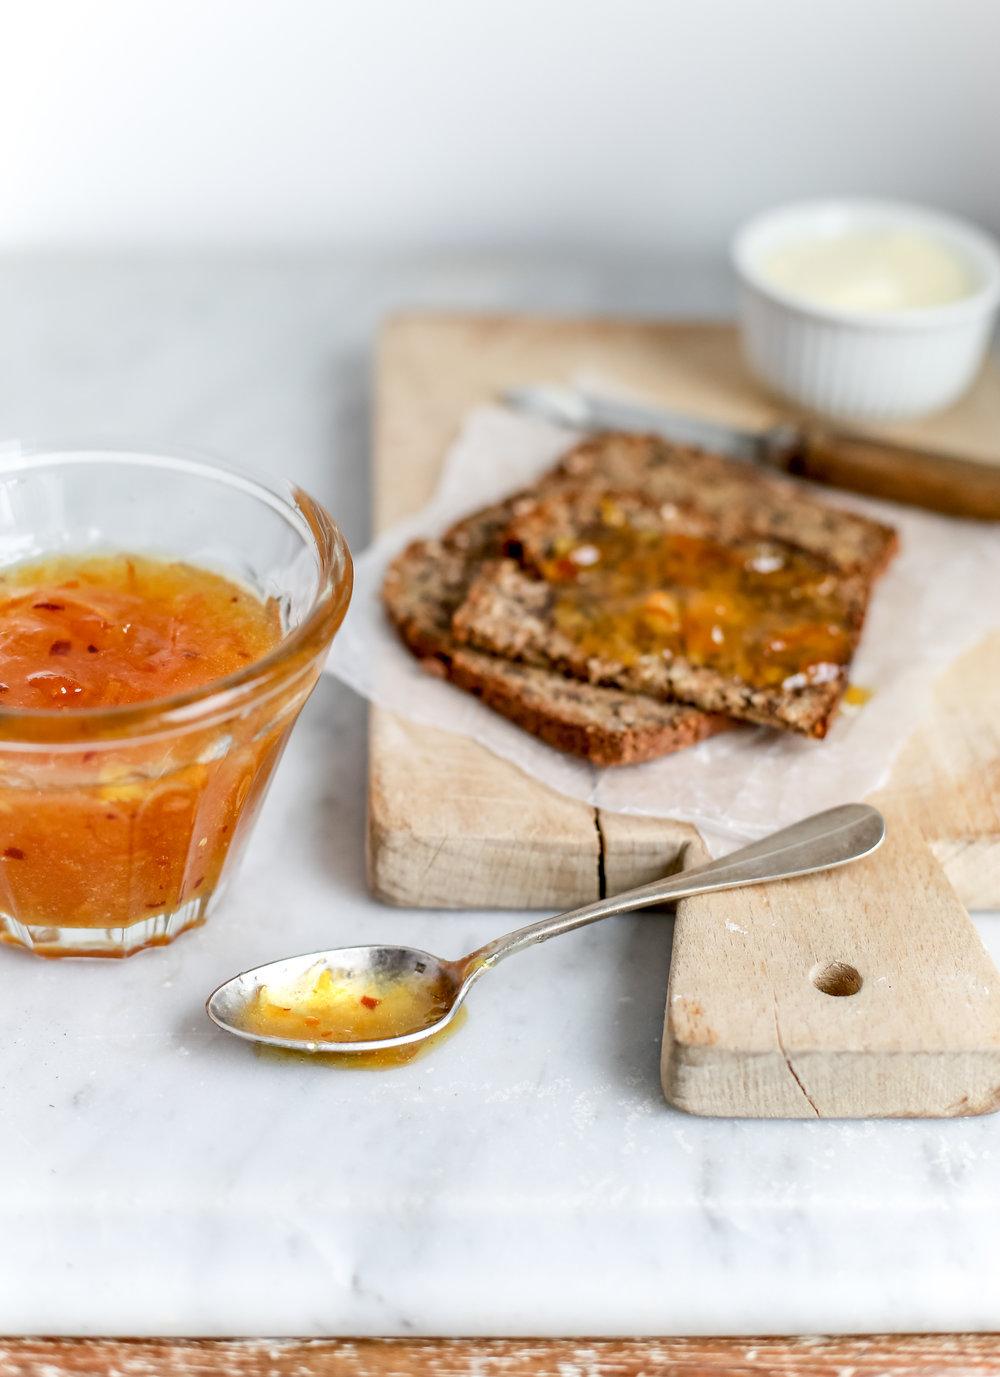 Heather Bullard | Spicy Orange Marmalade